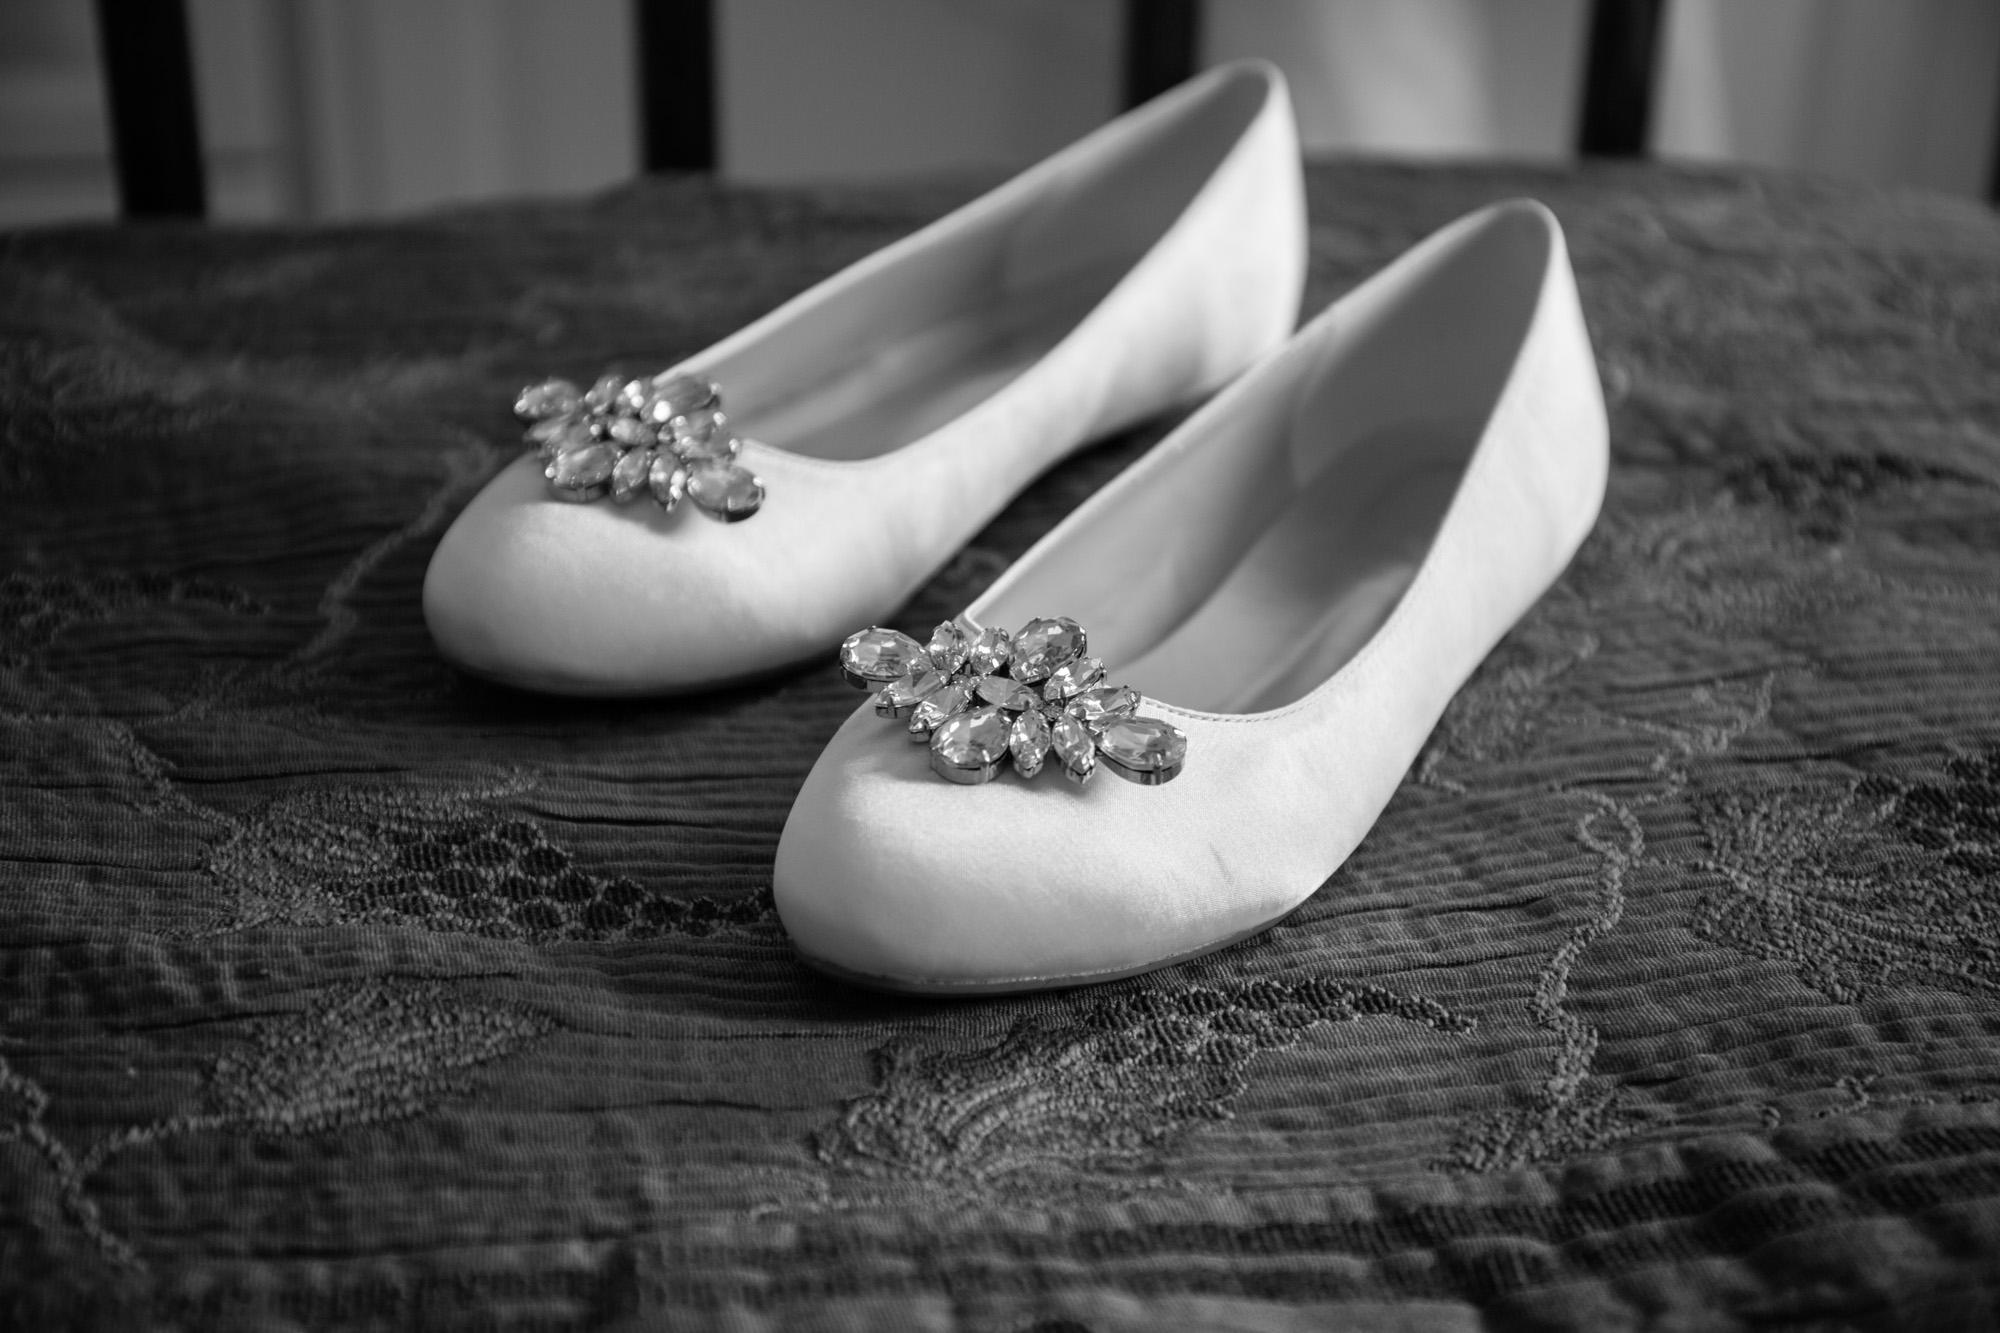 weddings-couples-love-photographer-oxford-london-jonathan-self-photography-3.jpg